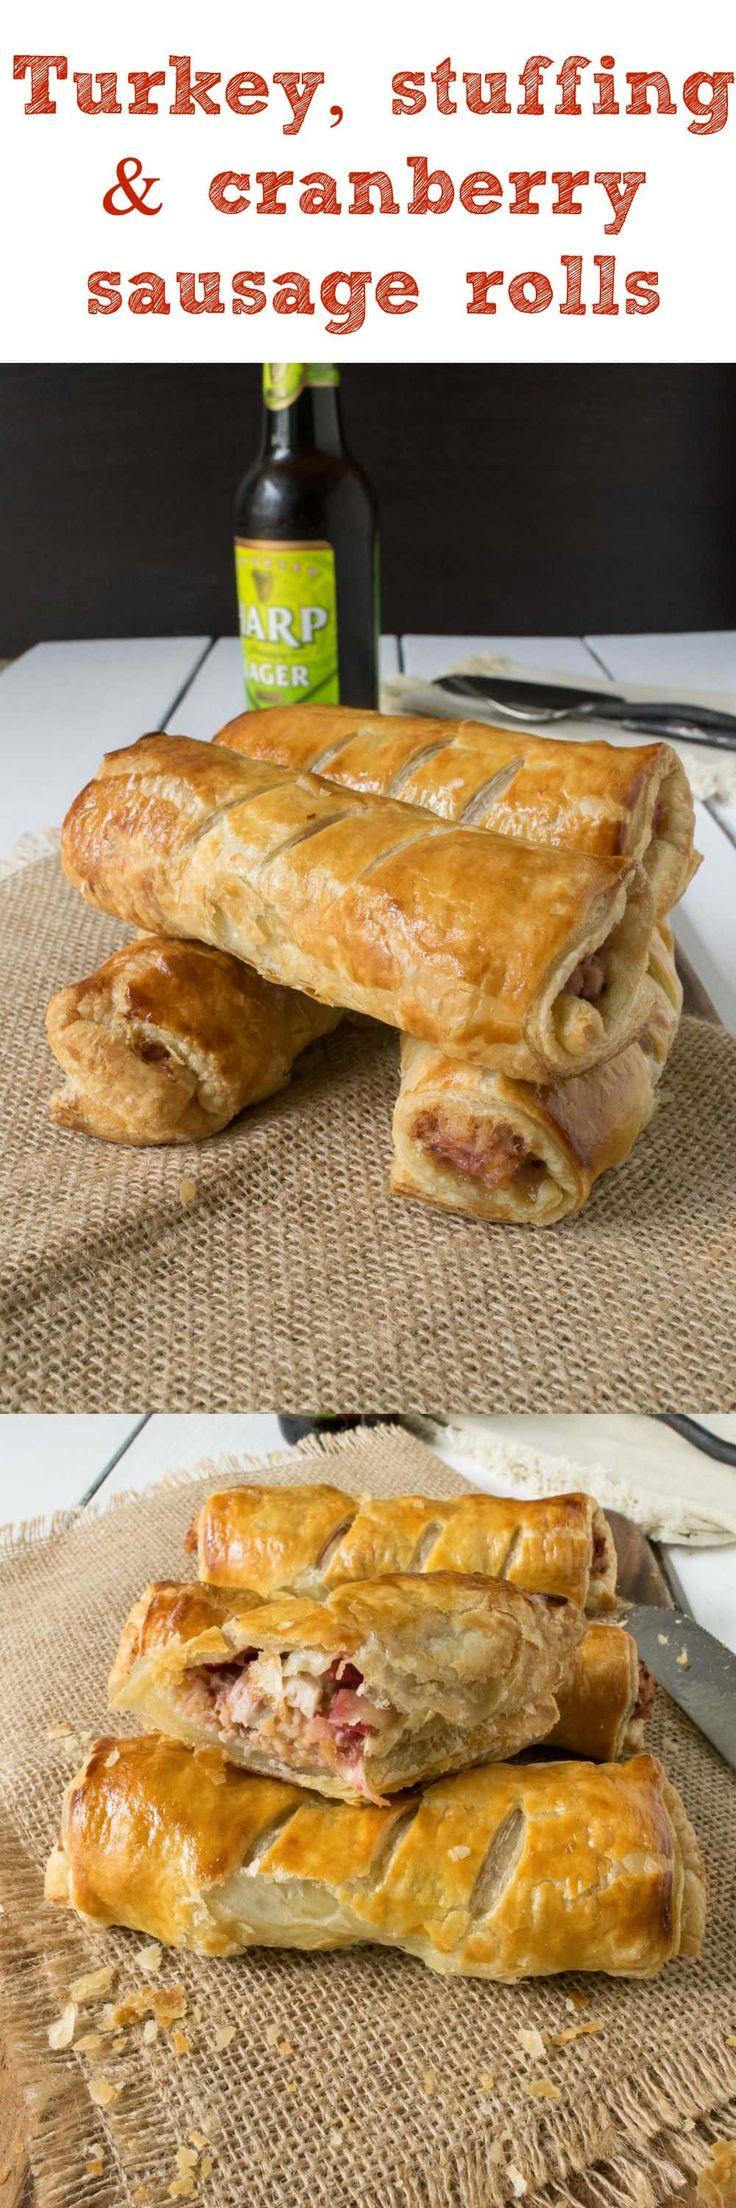 Turkey stuffing cranberry sausage rolls